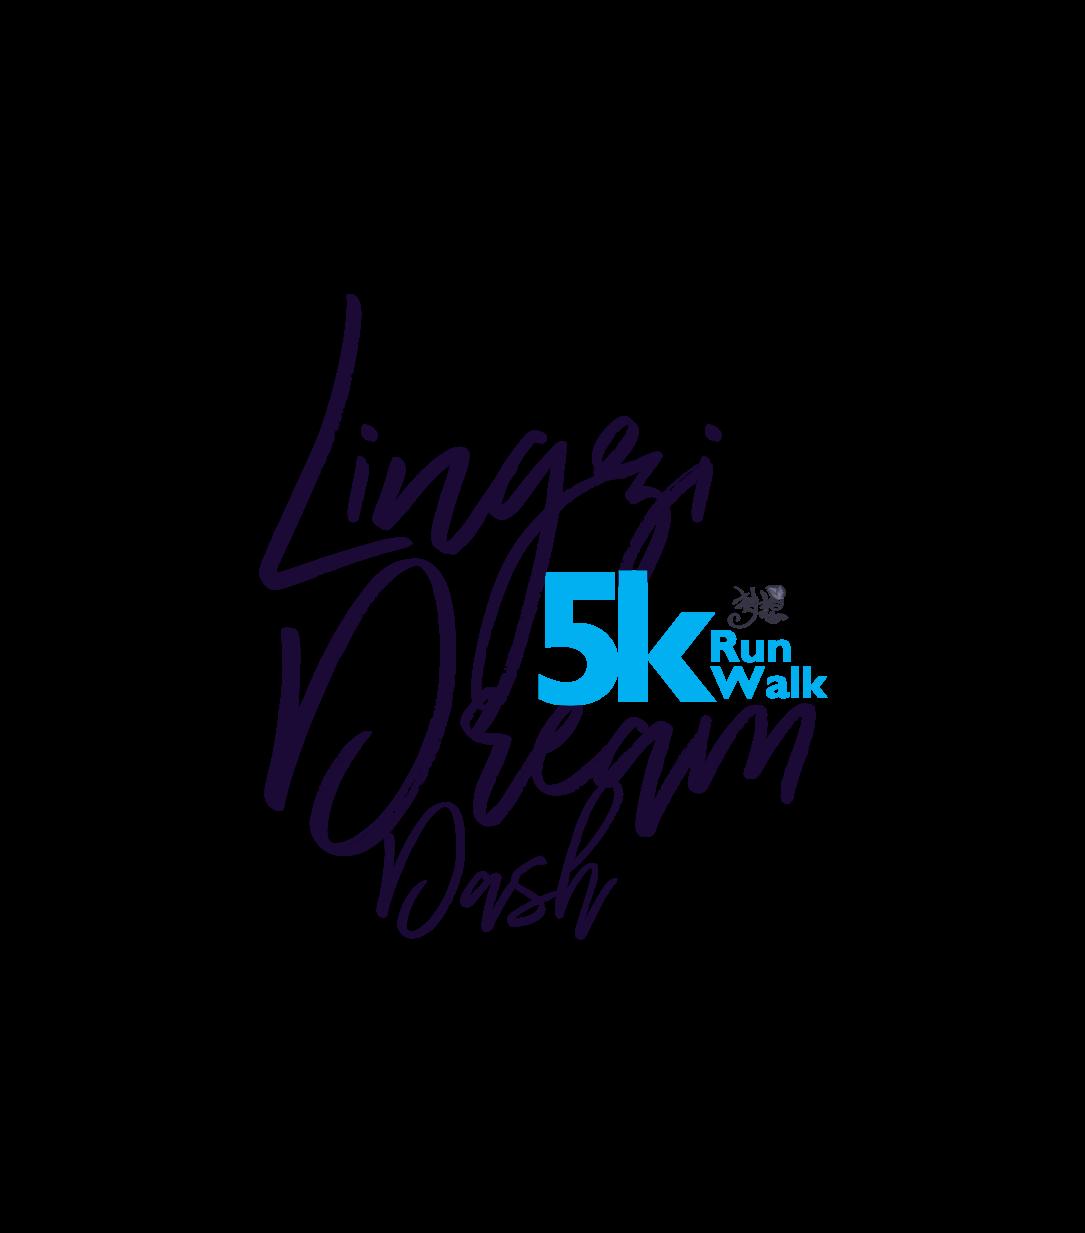 Lingzi Dream Dash 5K Logo 2019 v1